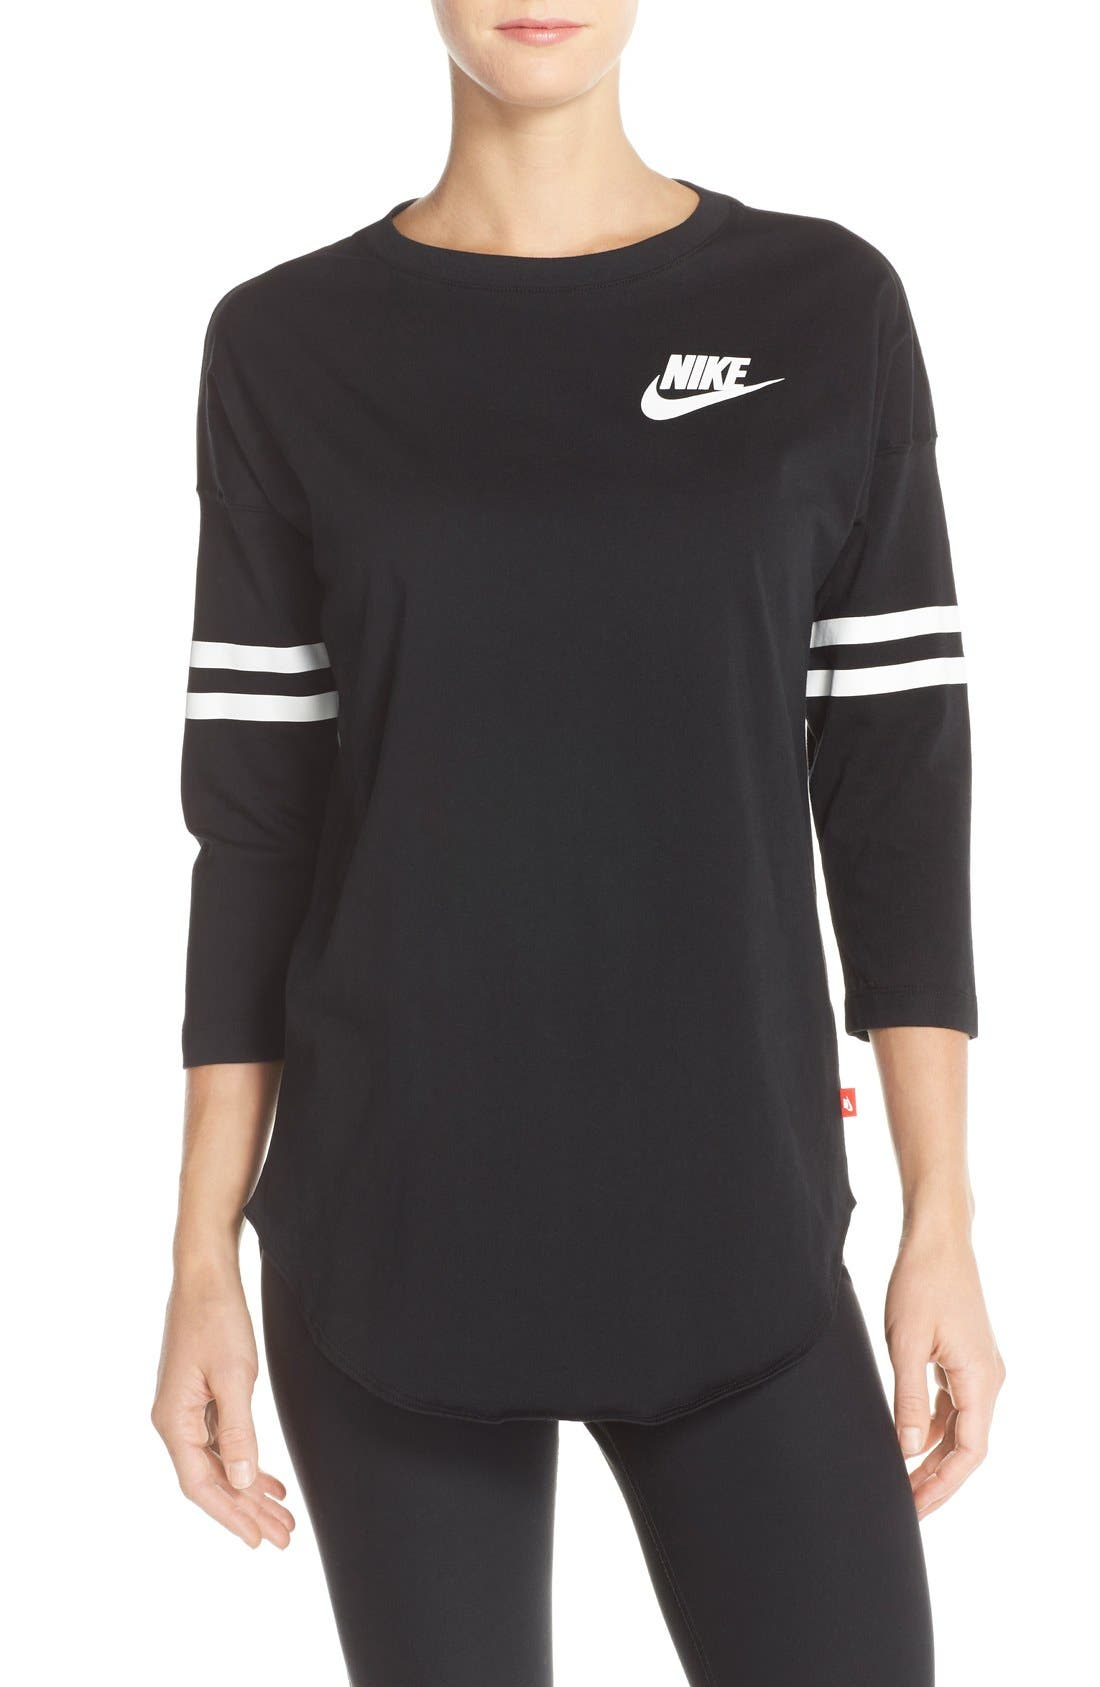 Alternate Image 1 Selected - Nike 'Just Do It Spirit' Top